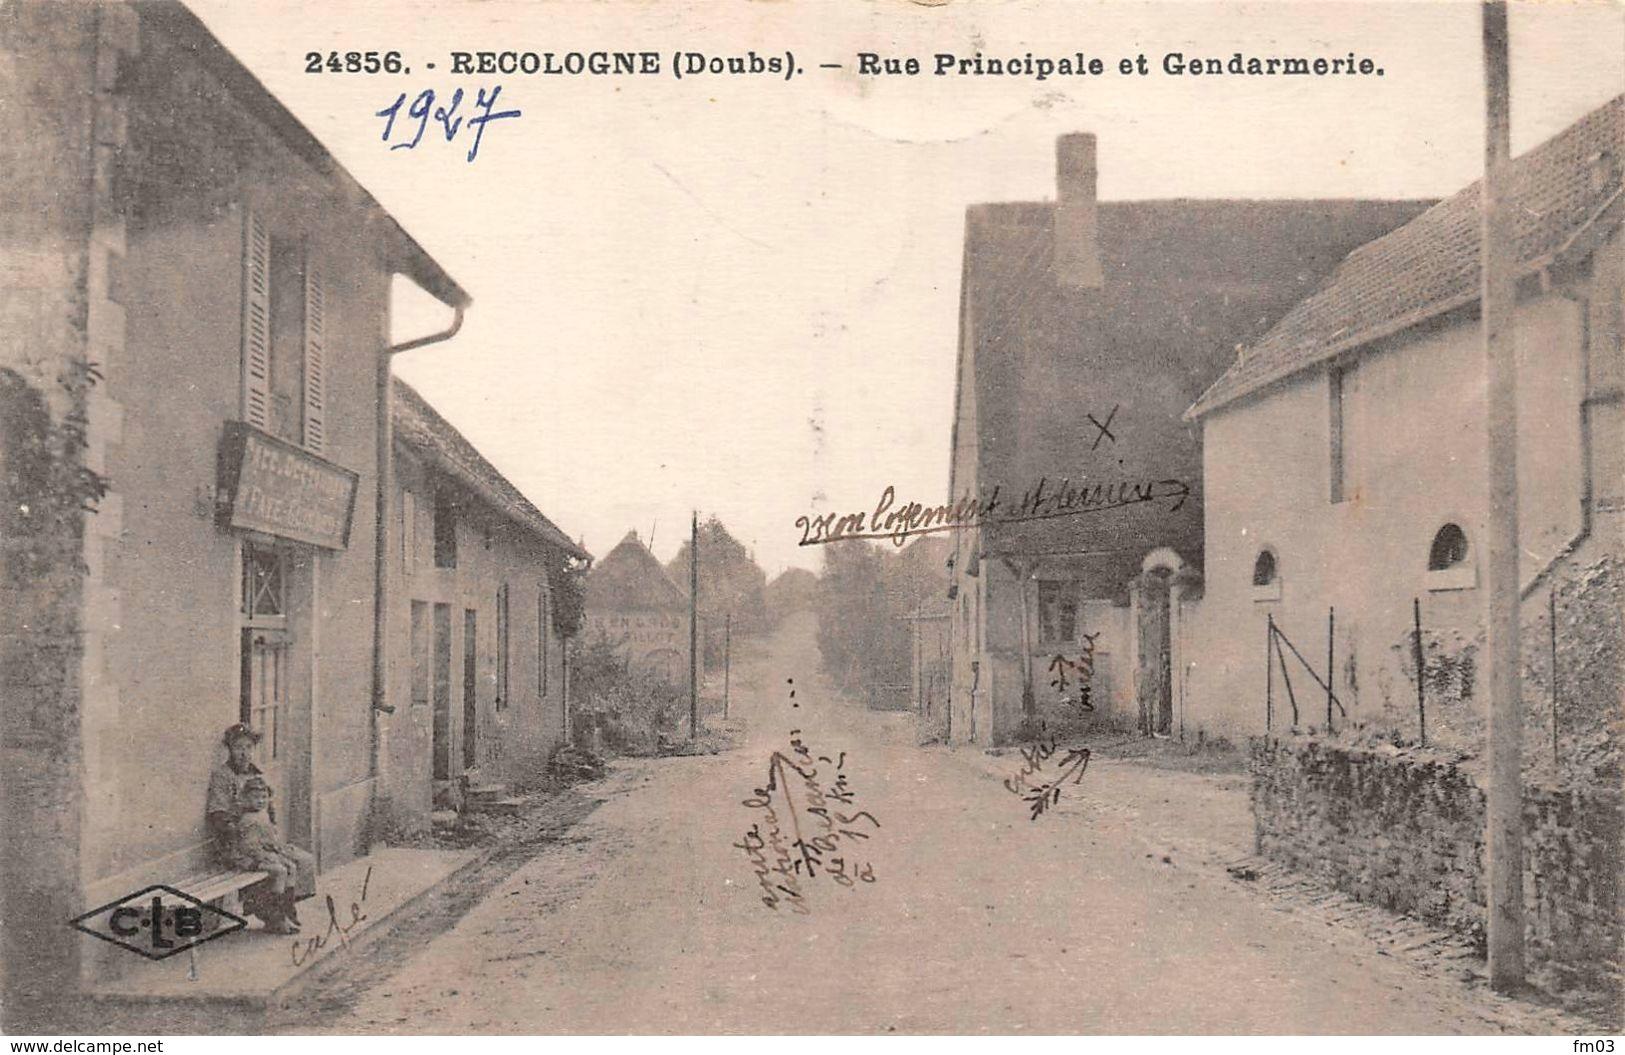 Recologne Canton Audeux Gendarmerie - Sonstige Gemeinden